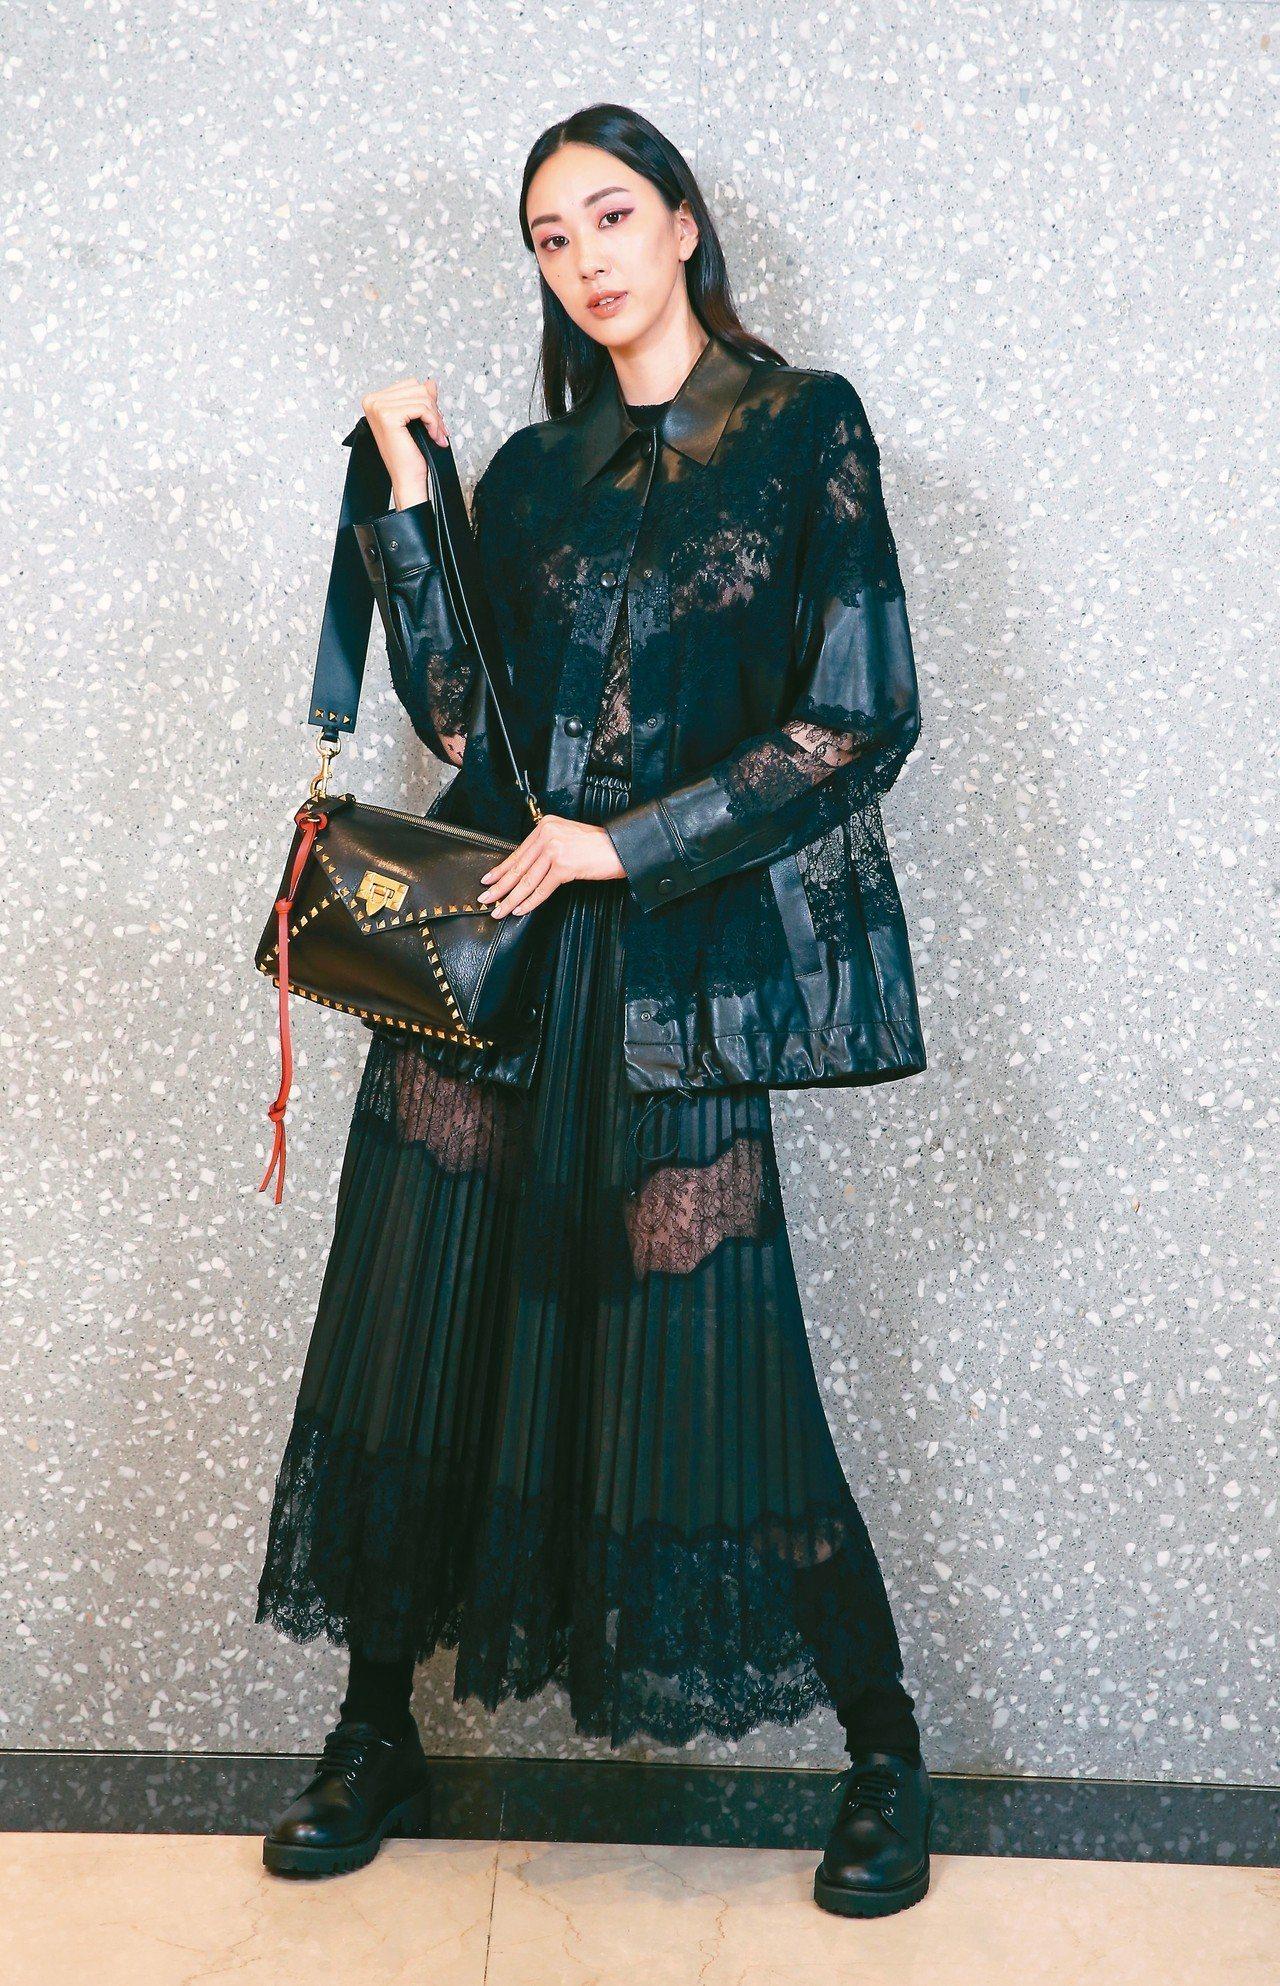 Valentino香緹蕾絲嵌飾皮革外套31萬元,香緹蕾絲嵌飾壓褶皮裙29萬4,0...